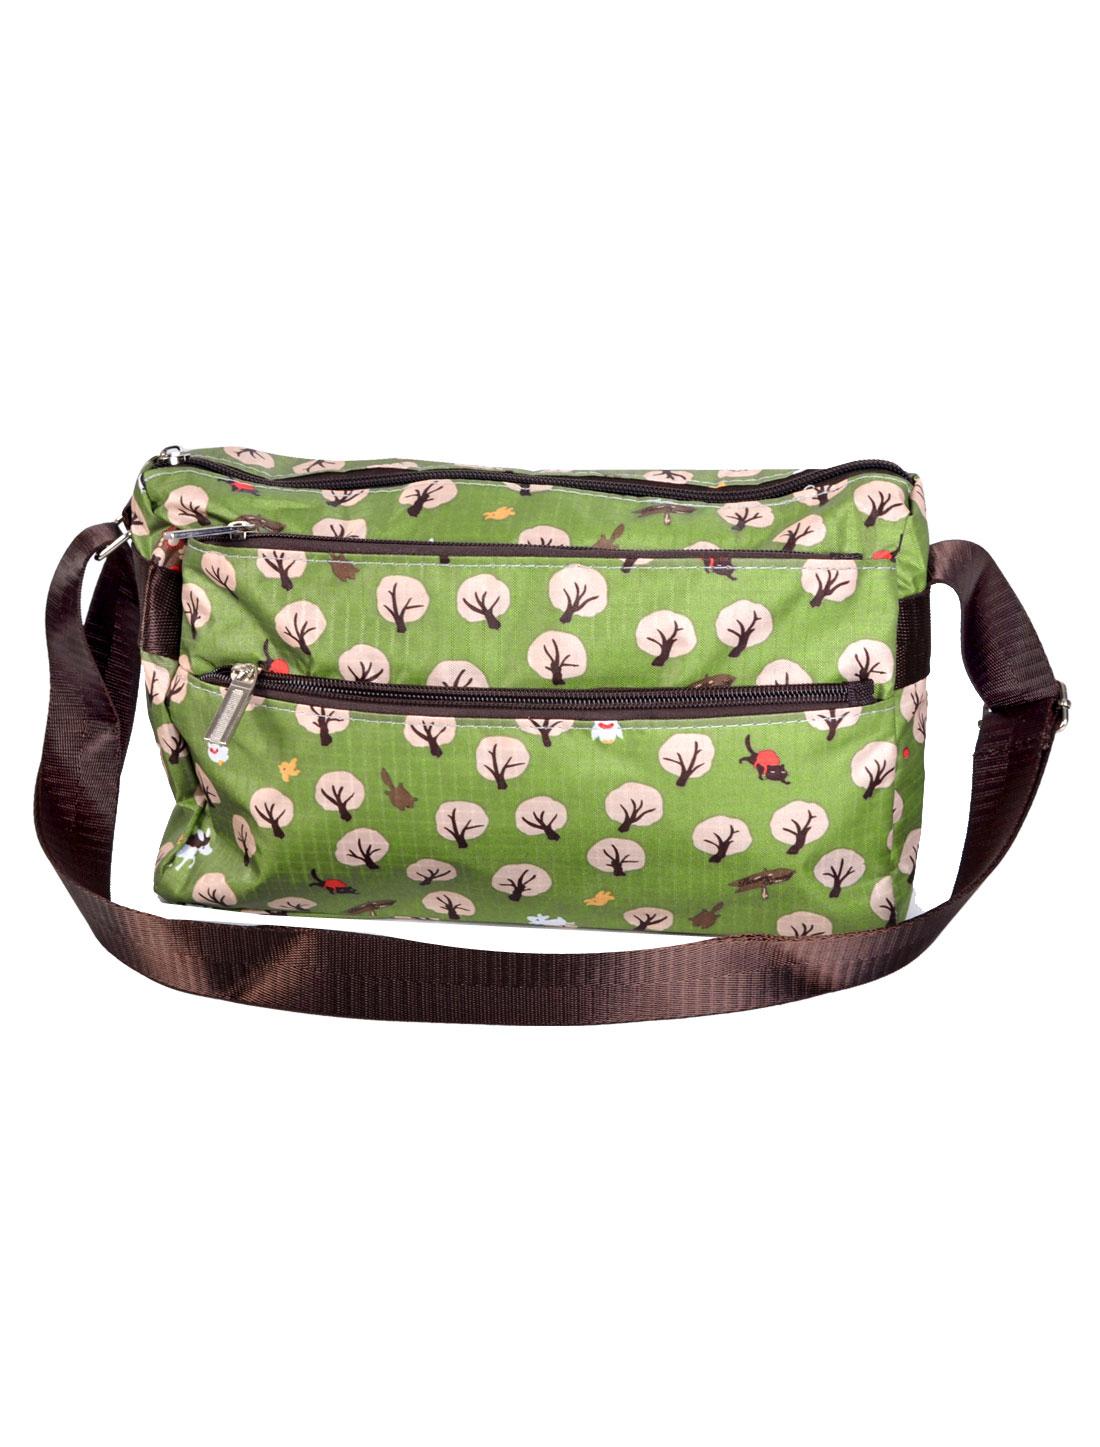 Lady Tree Pattern Rectangle Shaped Zipper Closure Nylon Shoulder Bag Handbag Olive Green